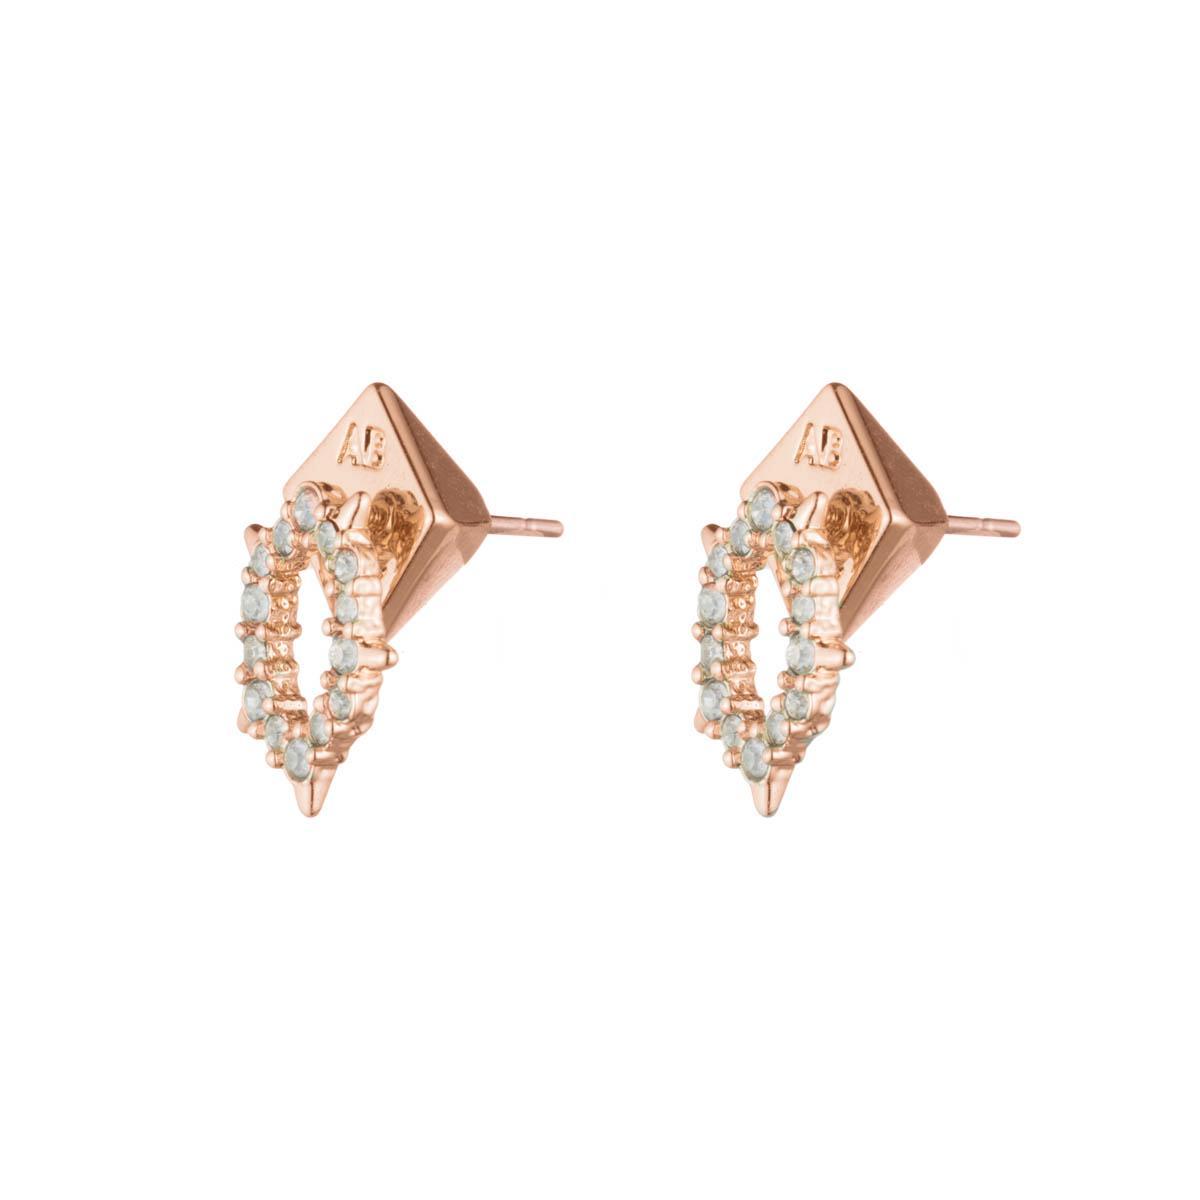 Alexis Bittar Crystal Encrusted Spiked Stud Earring uiyu75